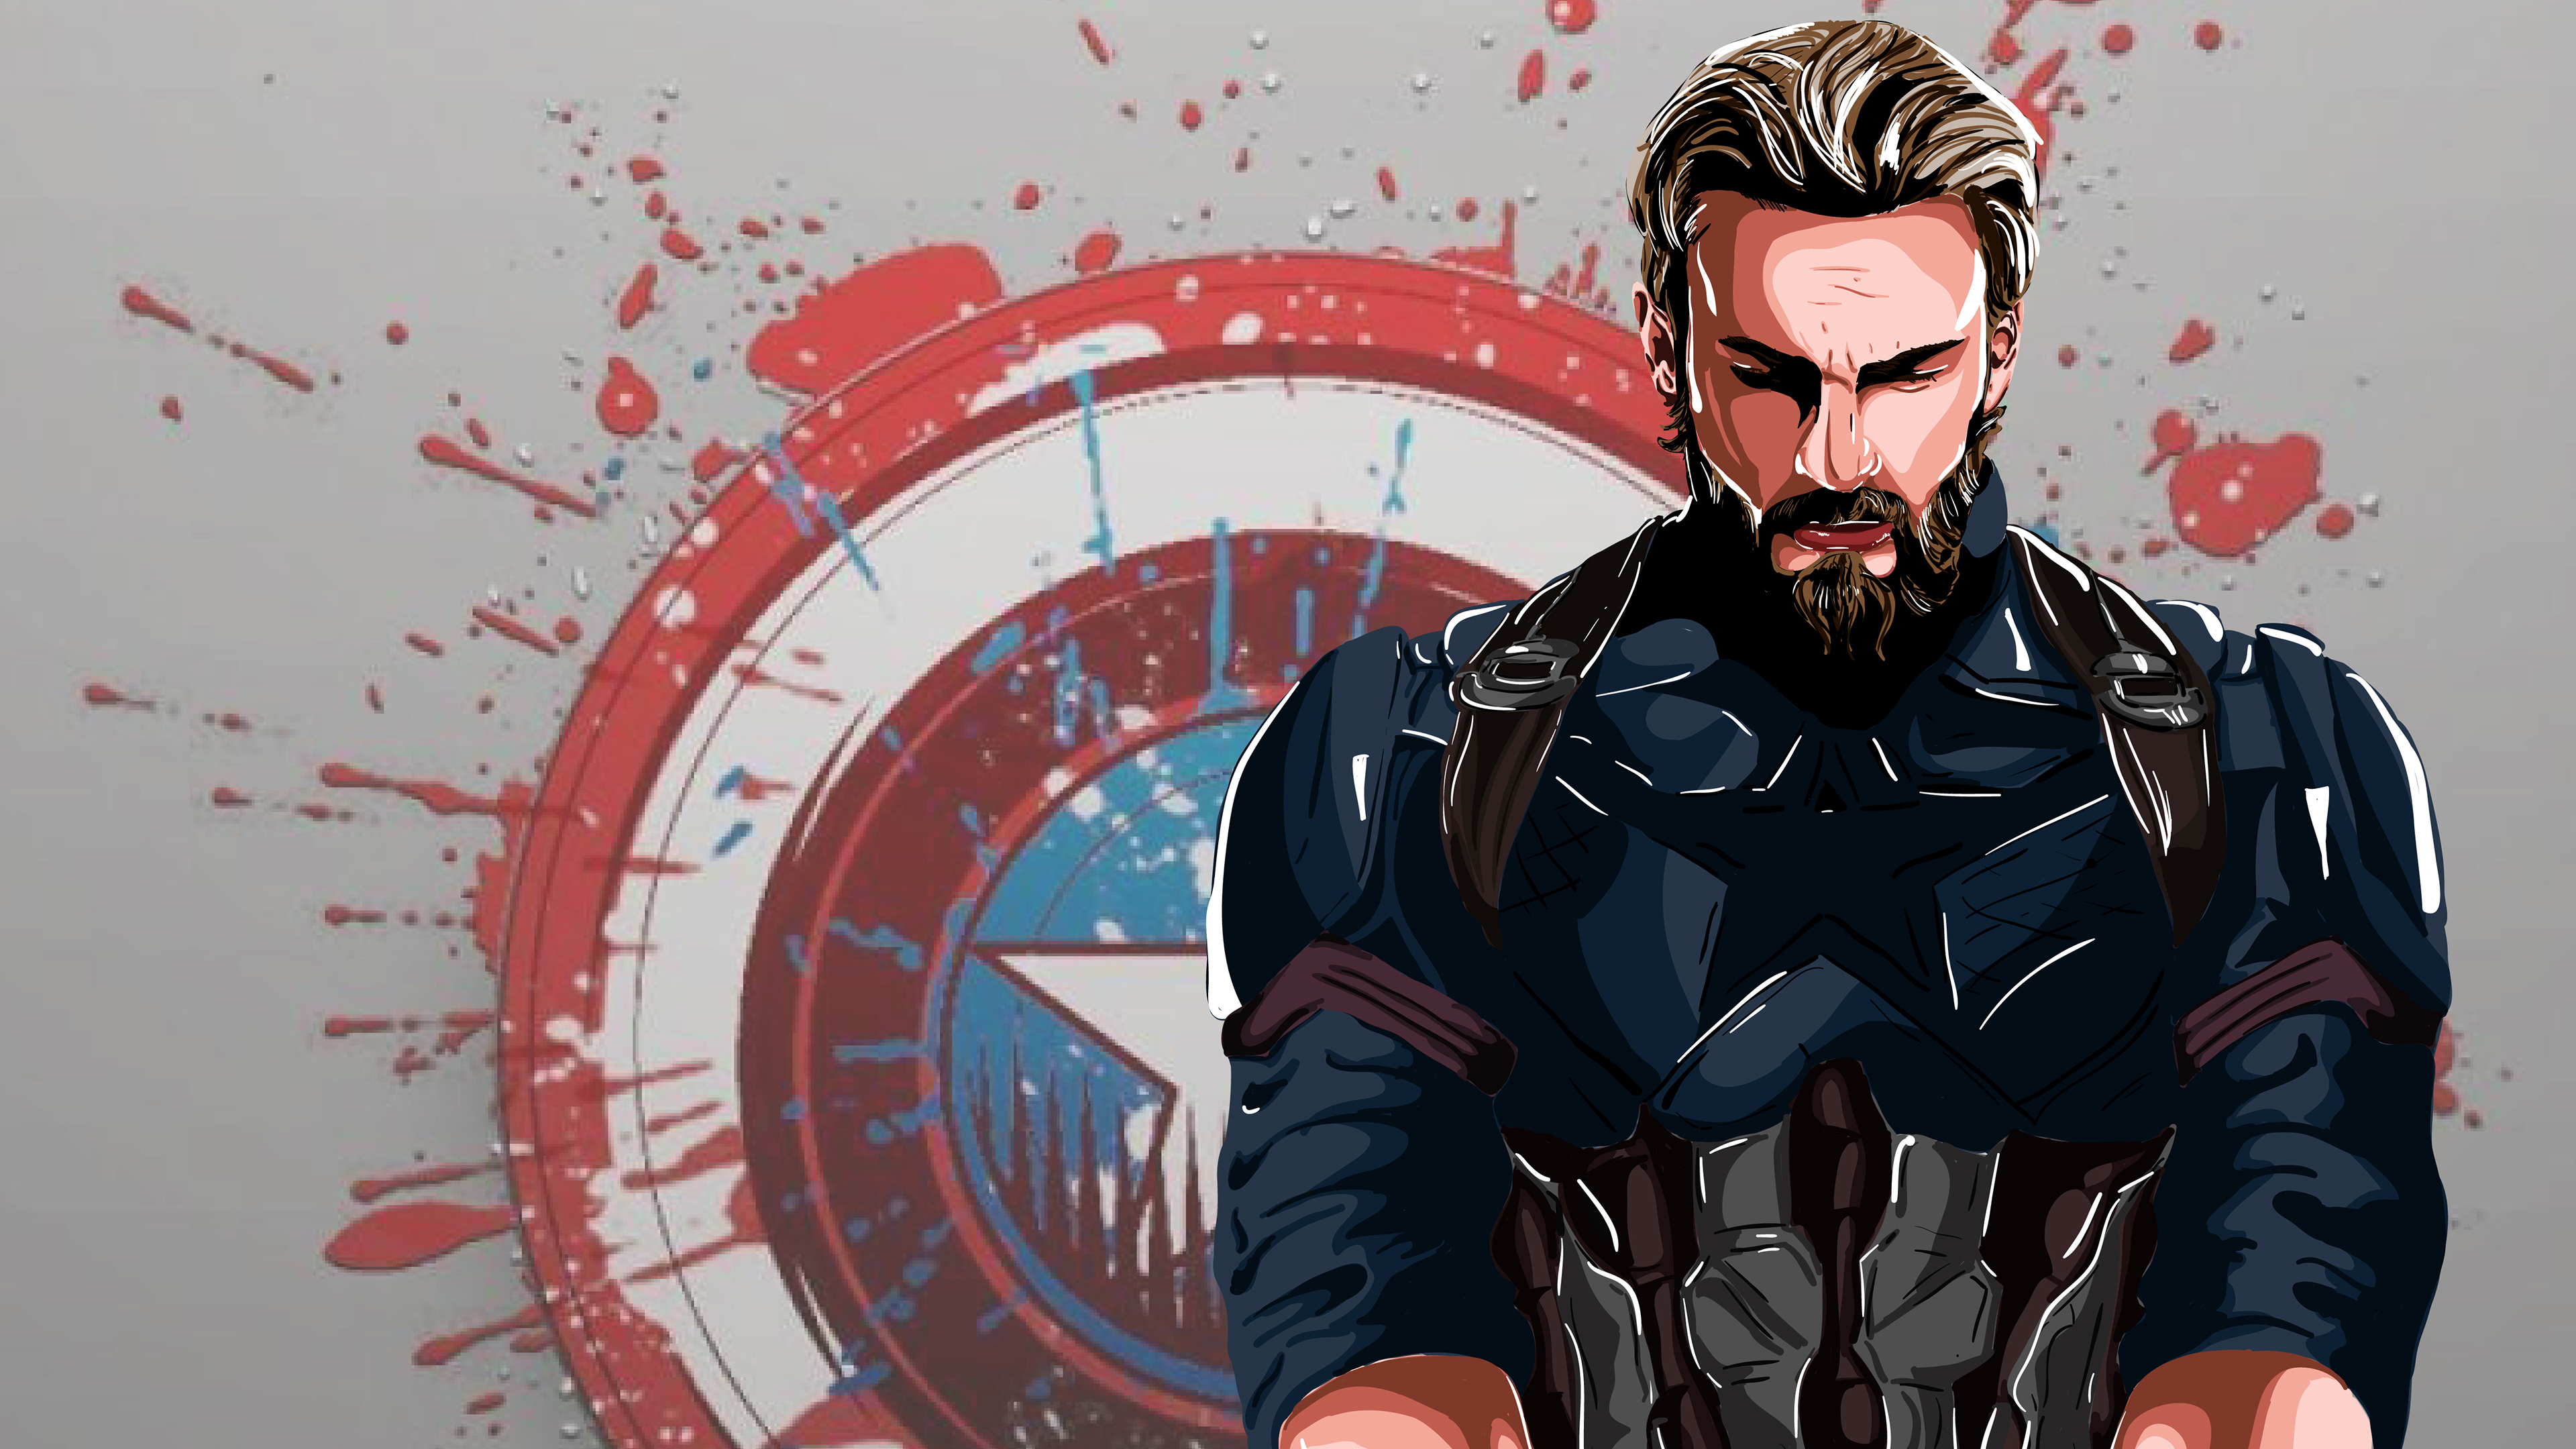 Captain America New Art 4k superheroes wallpapers, hd ...